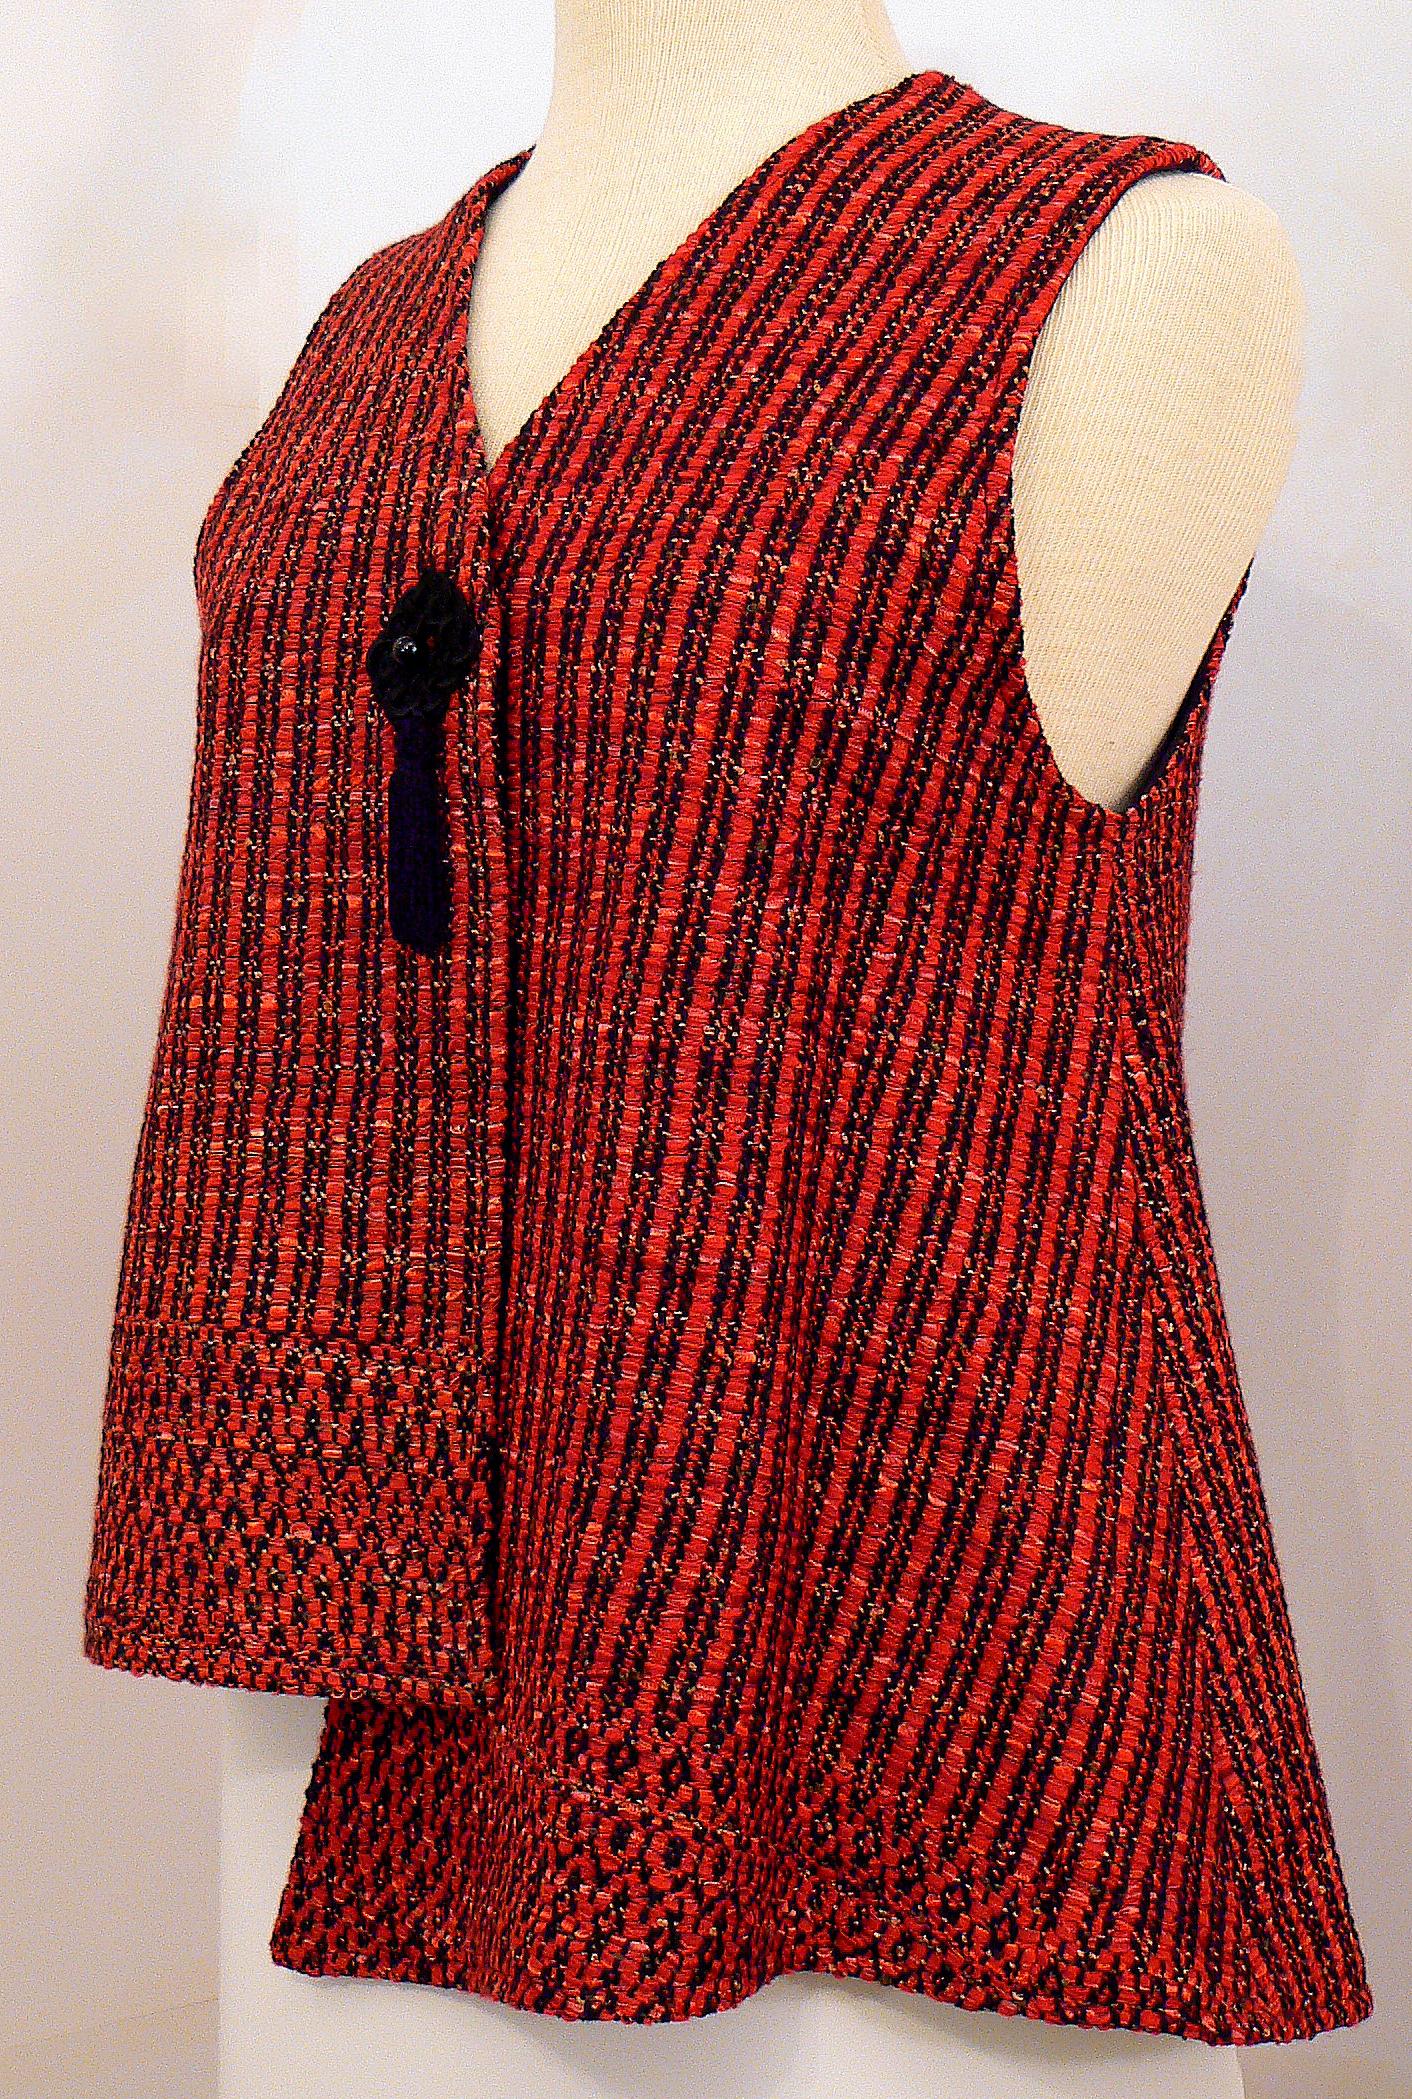 Handwoven Clothing, Vest, Kathleen Weir-West, 5-001.JPG